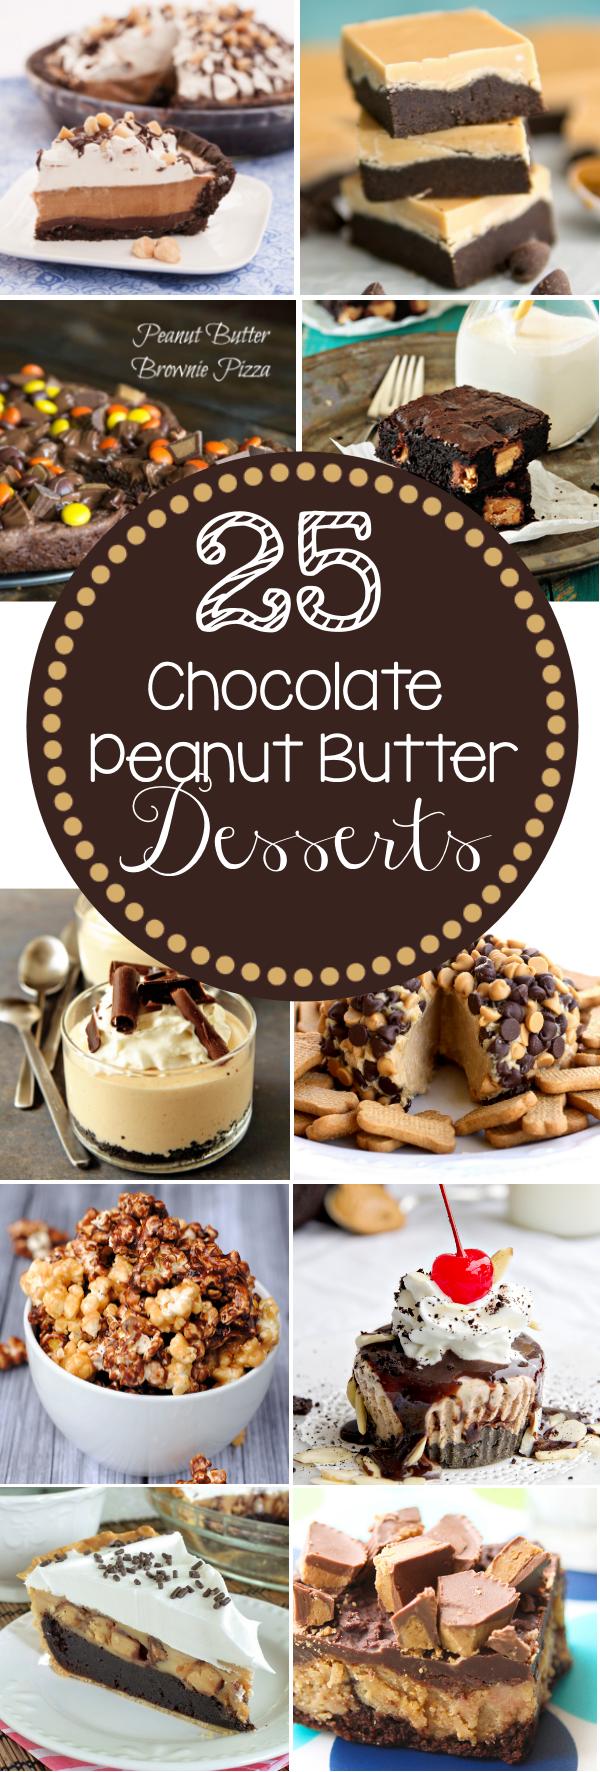 25 Chocolate Peanut Butter Desserts